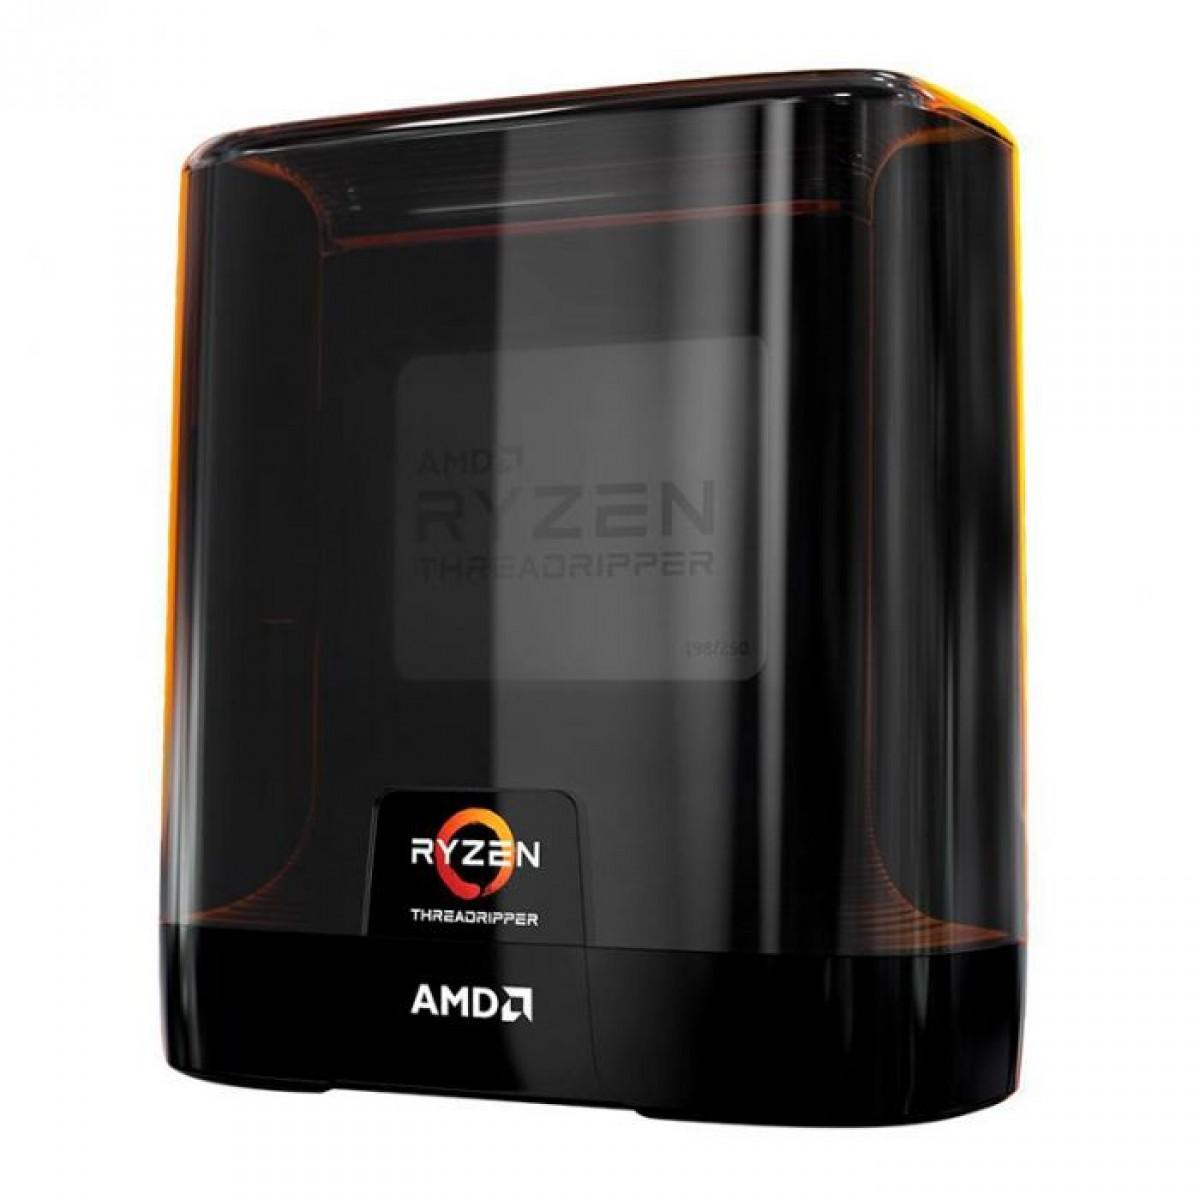 Processador AMD Ryzen Threadripper 3970X 3.7GHz (4.5GHz Max Turbo) 32-Core 64-Thread, 144MB sTRX4, 100-100000011WOF